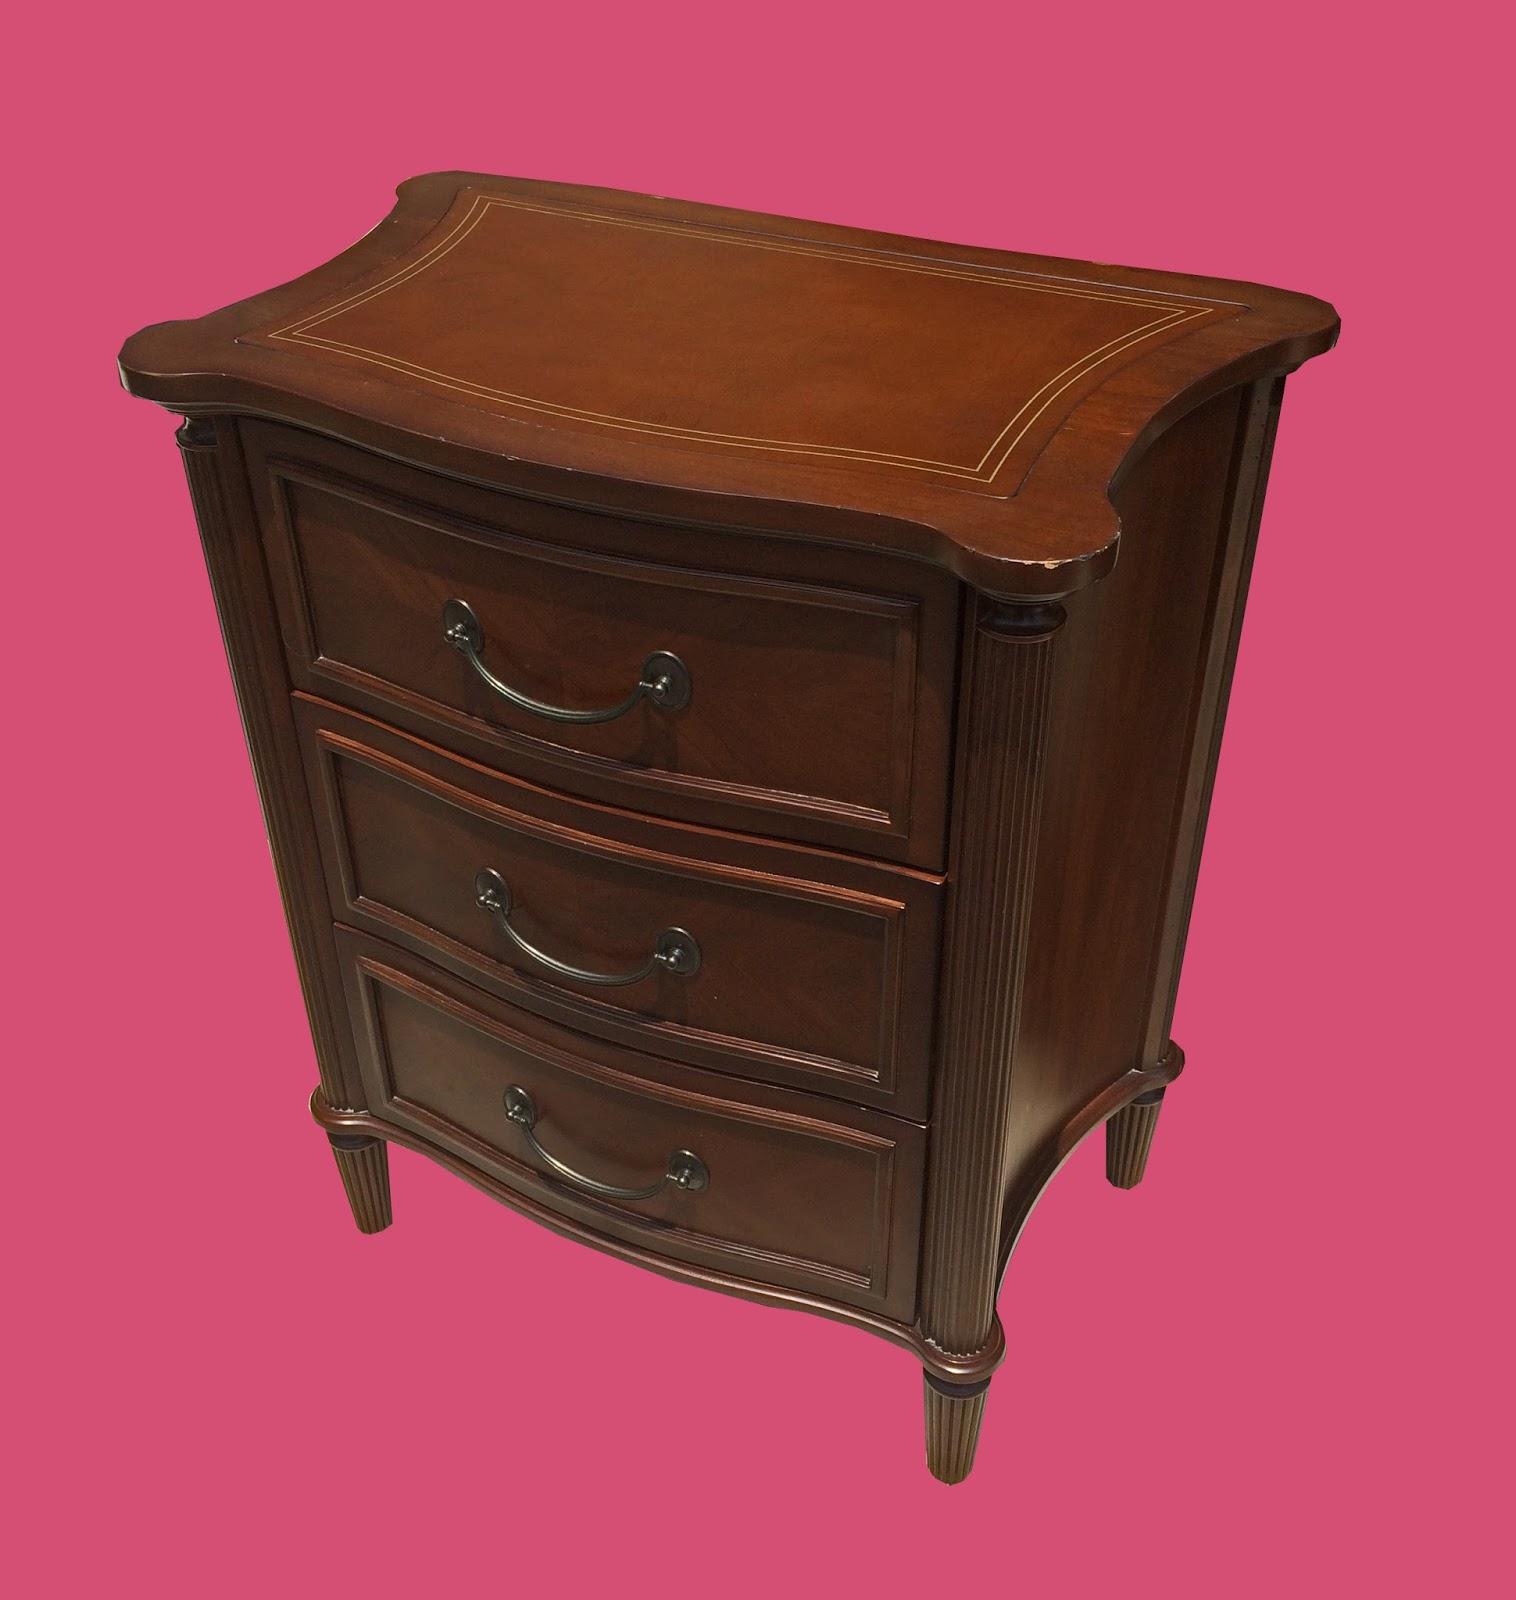 uhuru furniture collectibles bombay company bedroom set